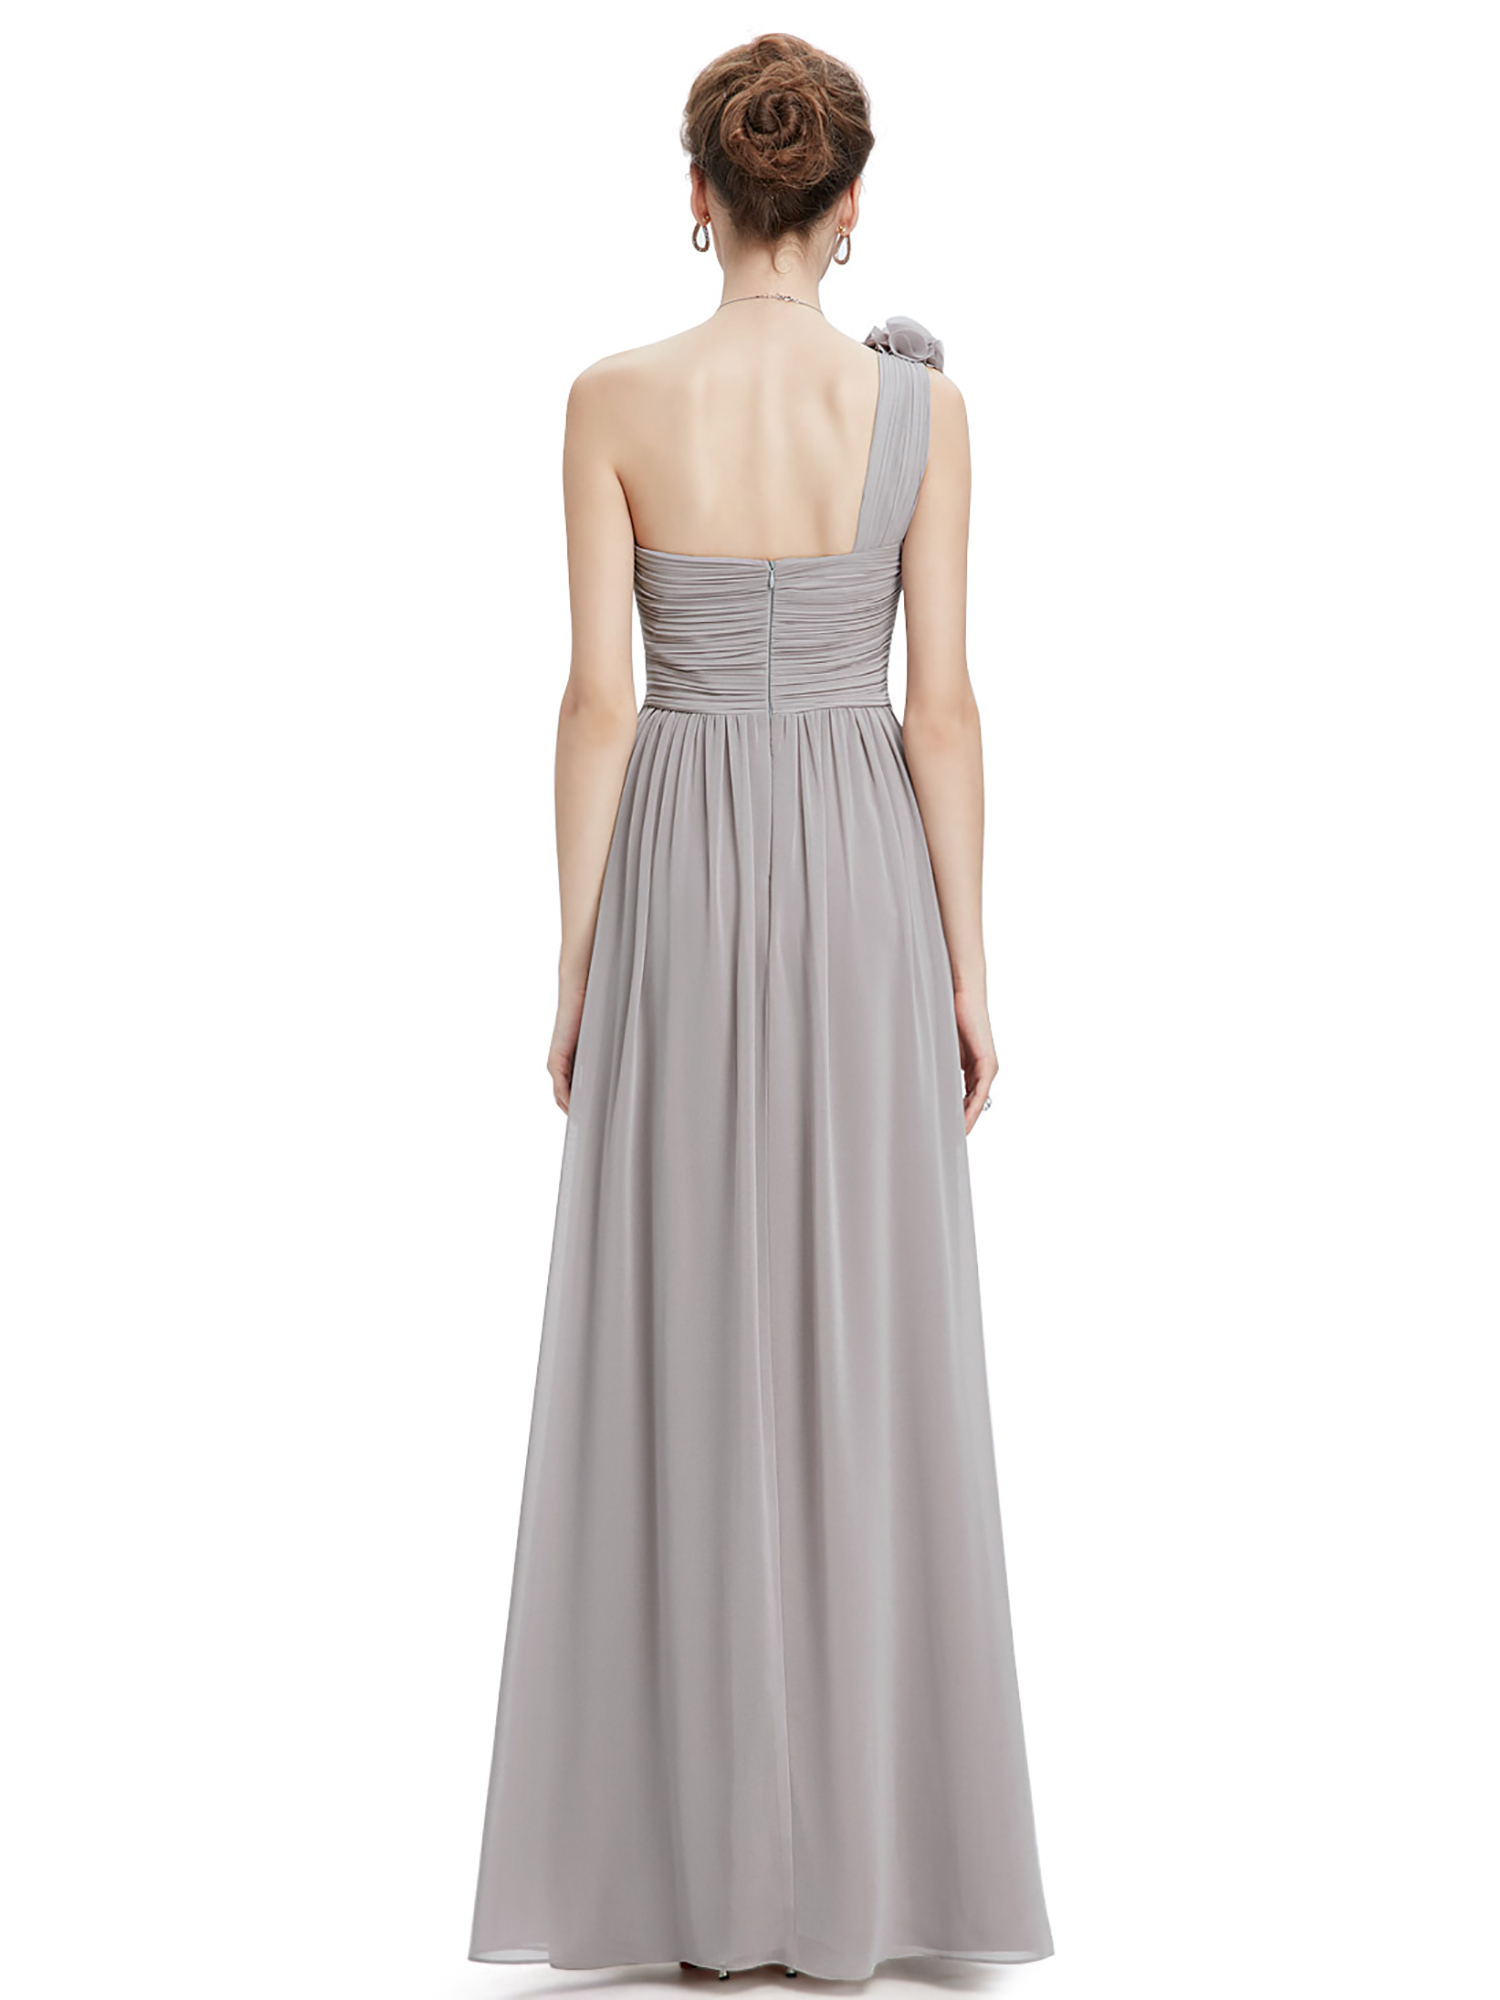 Ever-Pretty-US-Long-Bridesmaid-Dresses-One-Shoulder-Evening-Party-Dresses-08237 thumbnail 29